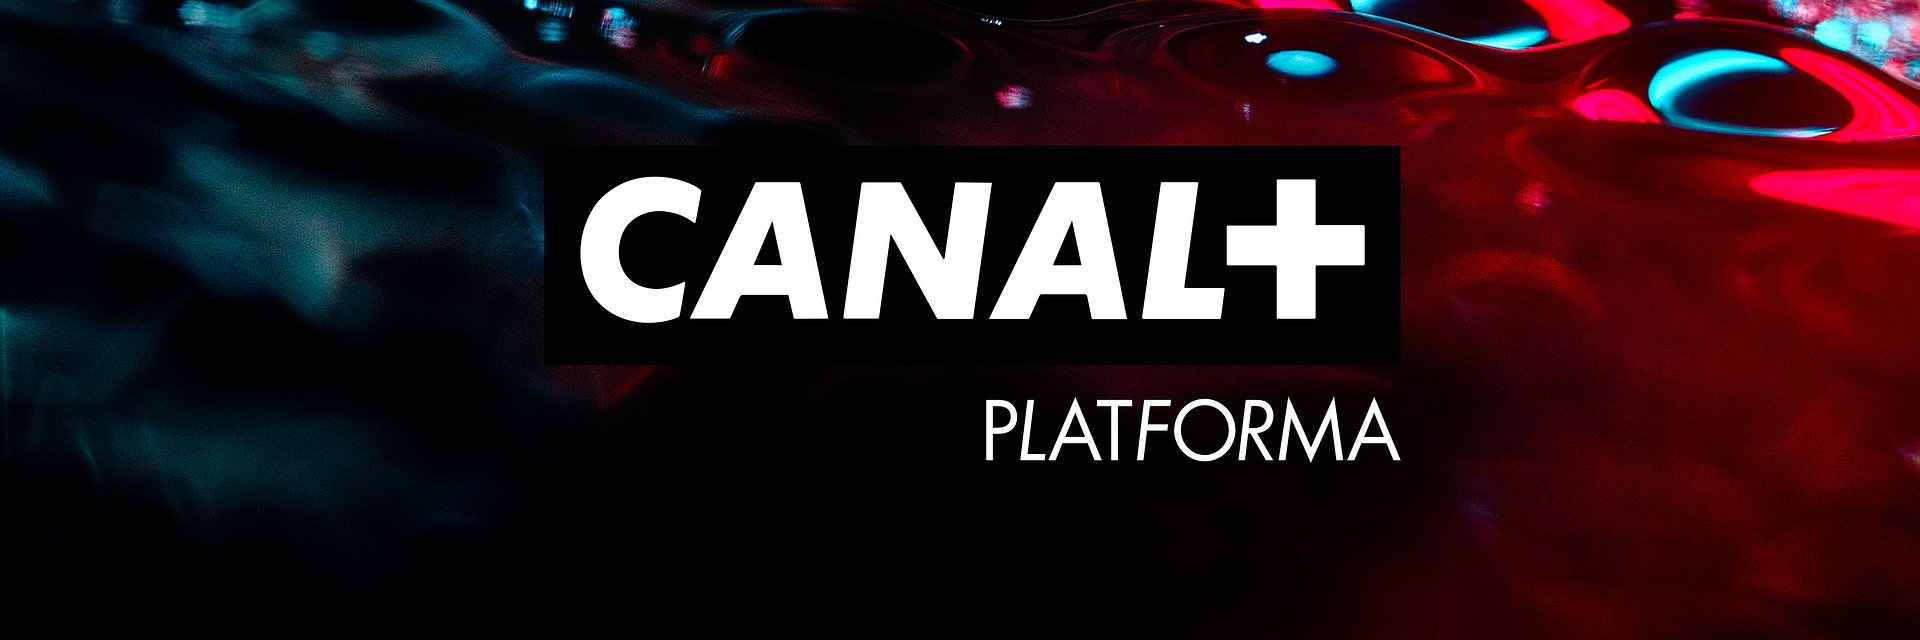 [PL/EN] Komunikat ITI Neovision S.A. (Platforma CANAL+)